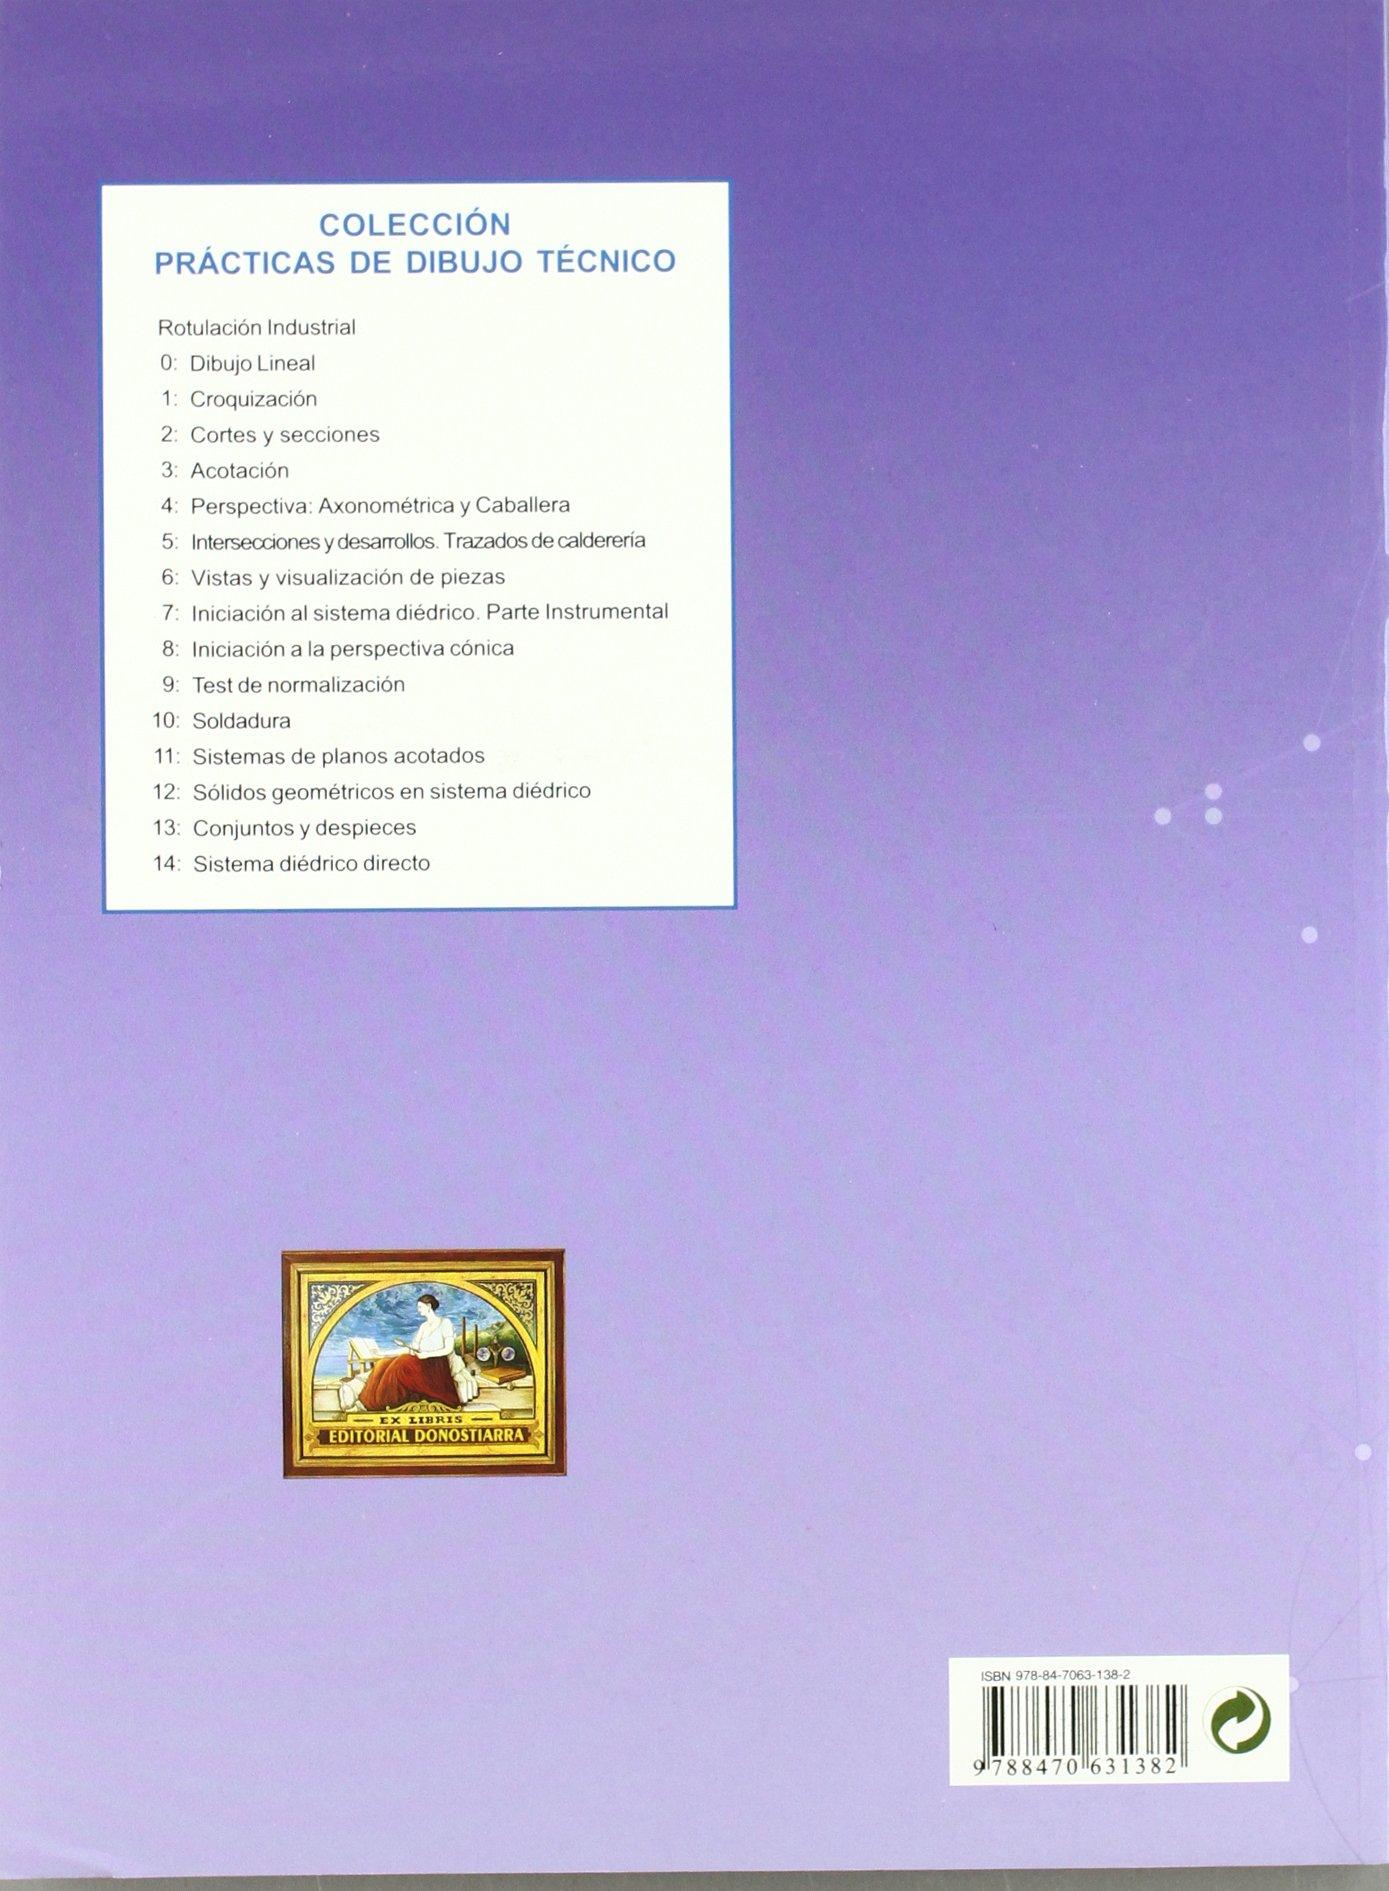 Prácticas de dibujo, n. 7 : sistema diédrico: 9788470631382: Amazon.com: Books